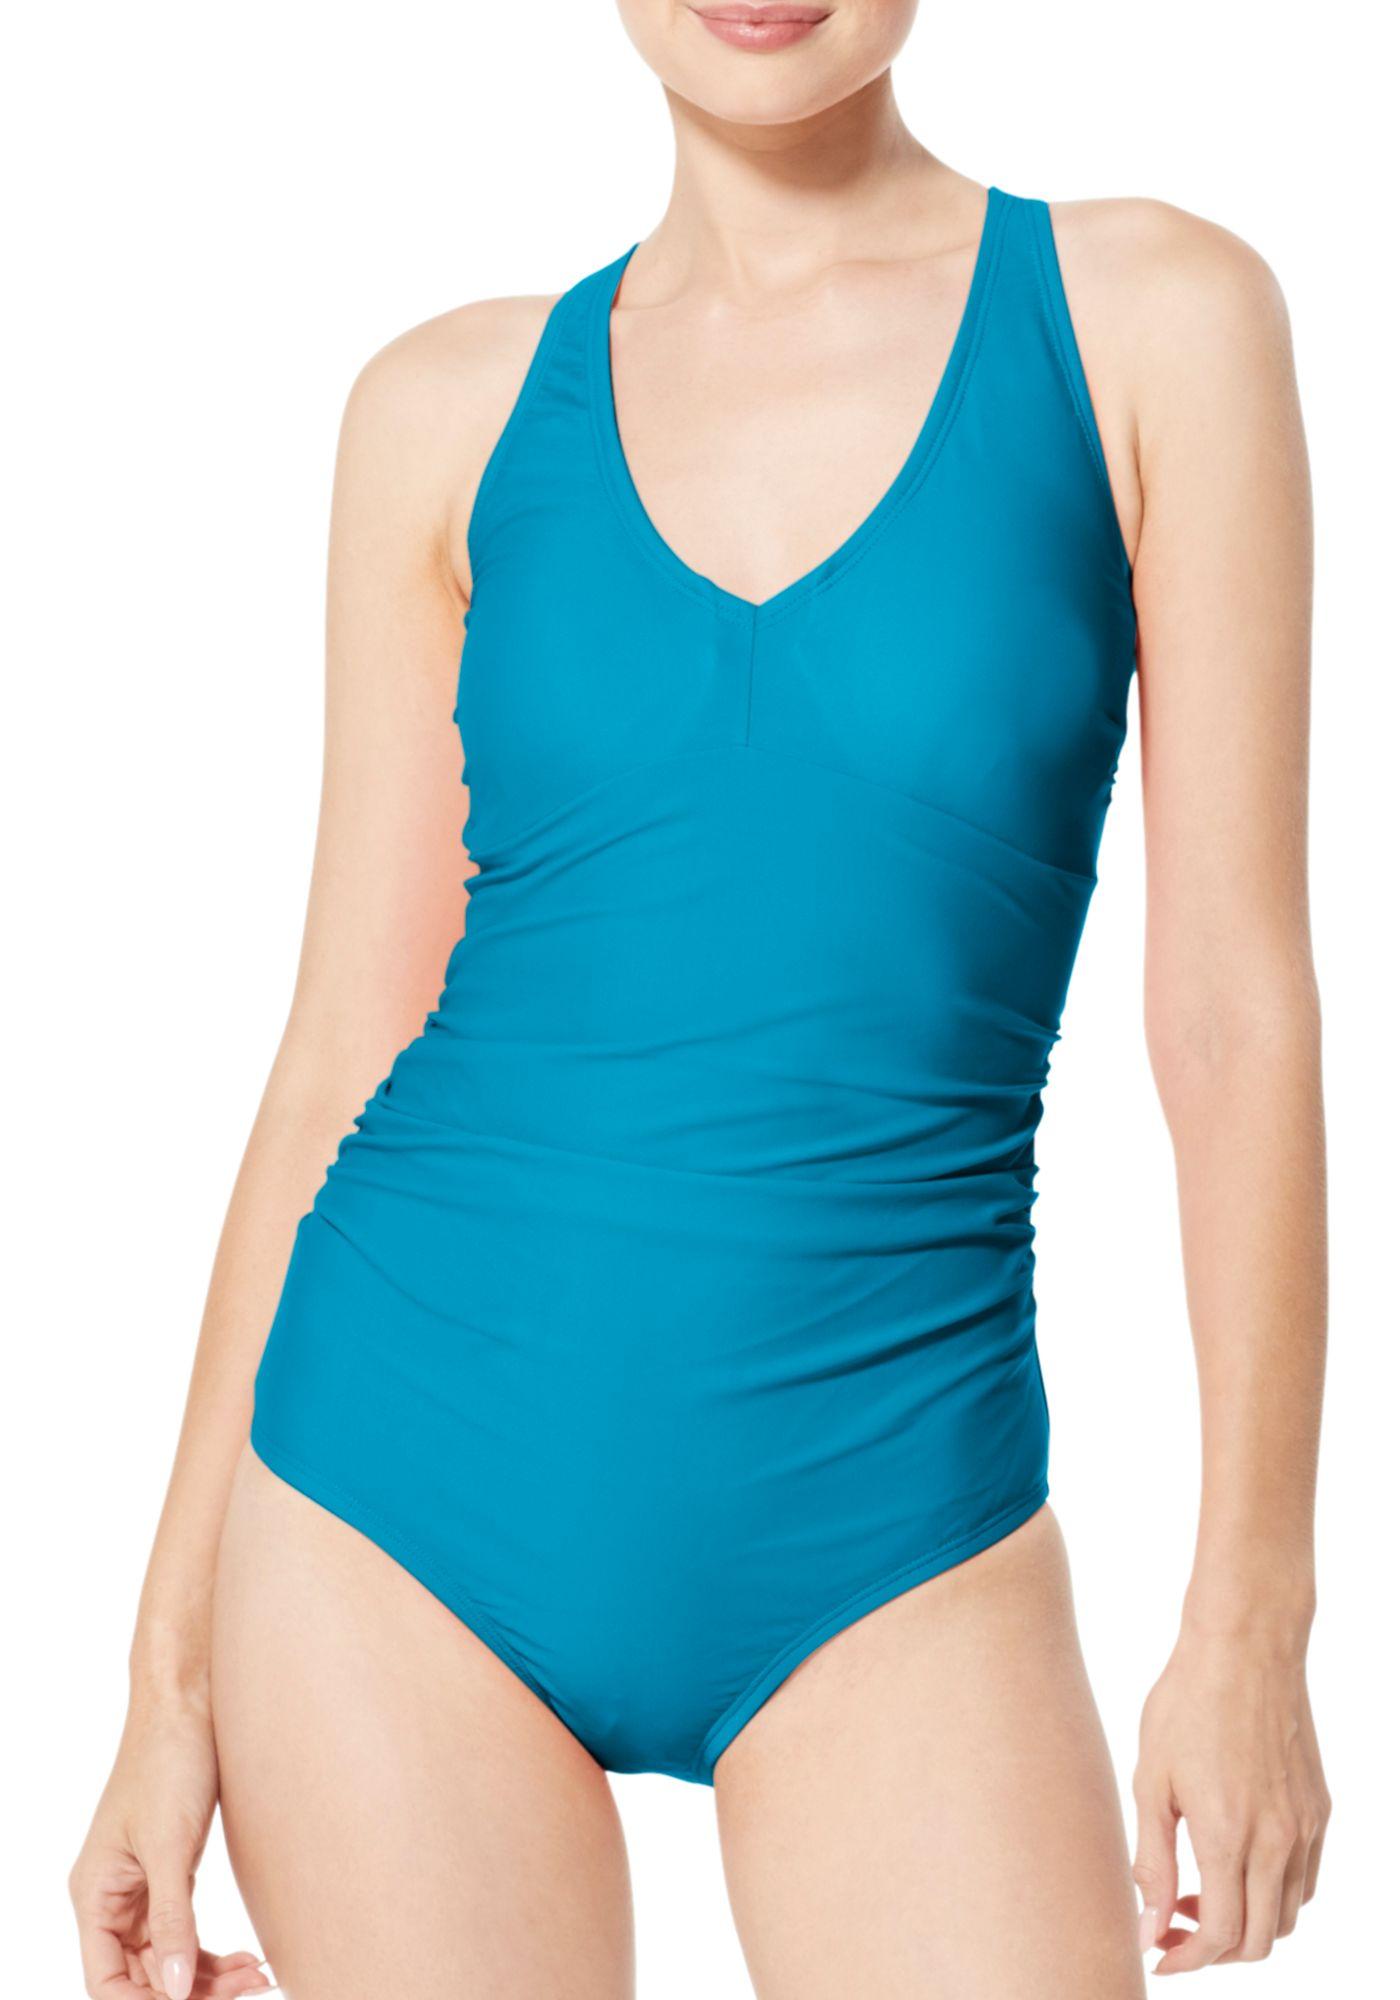 Speedo Women's V-Neck One Piece Swimsuit